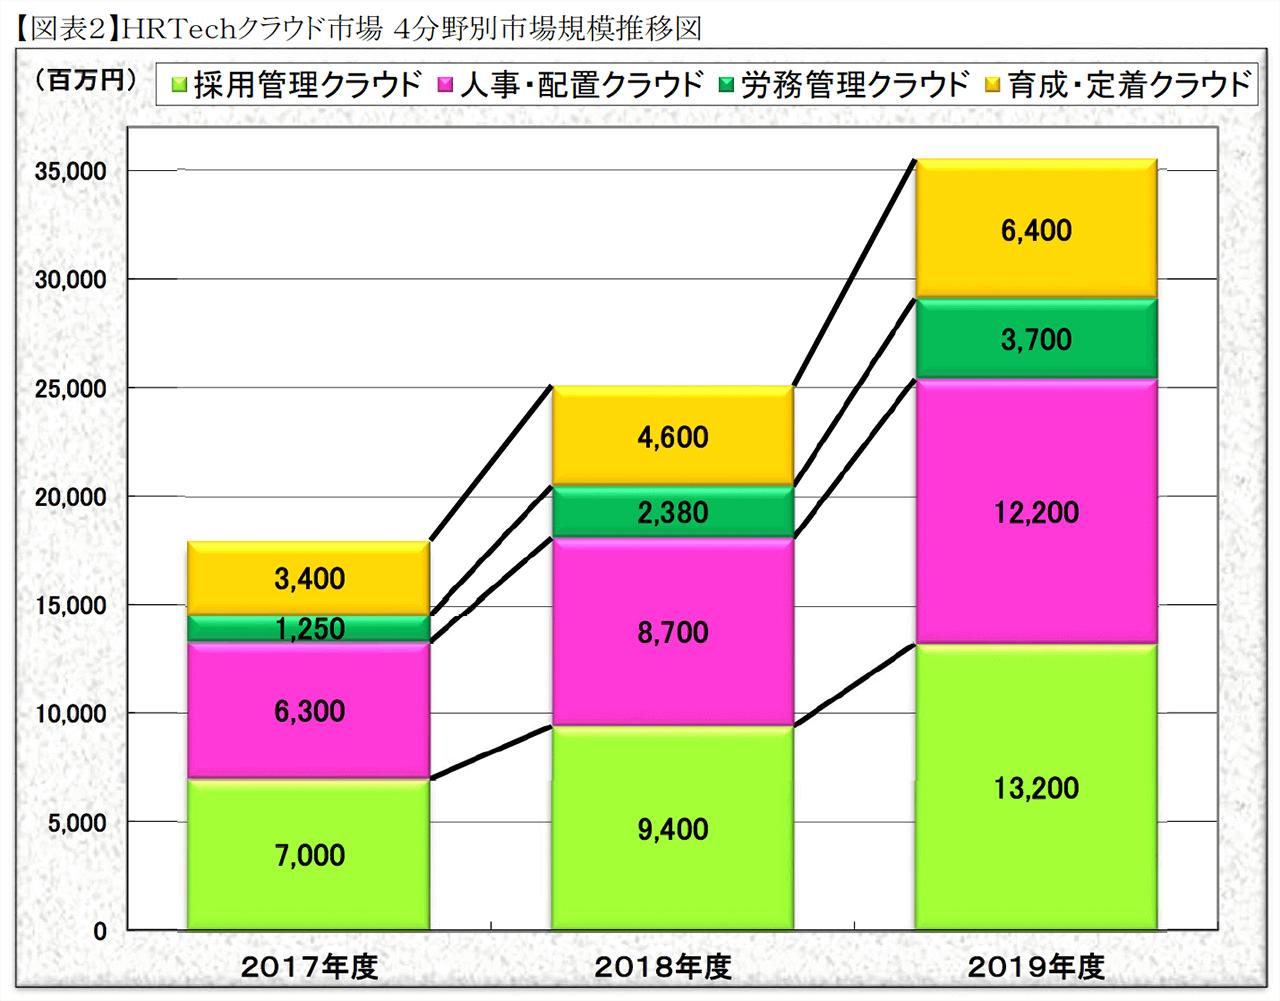 HRTechクラウド市場規模推移図